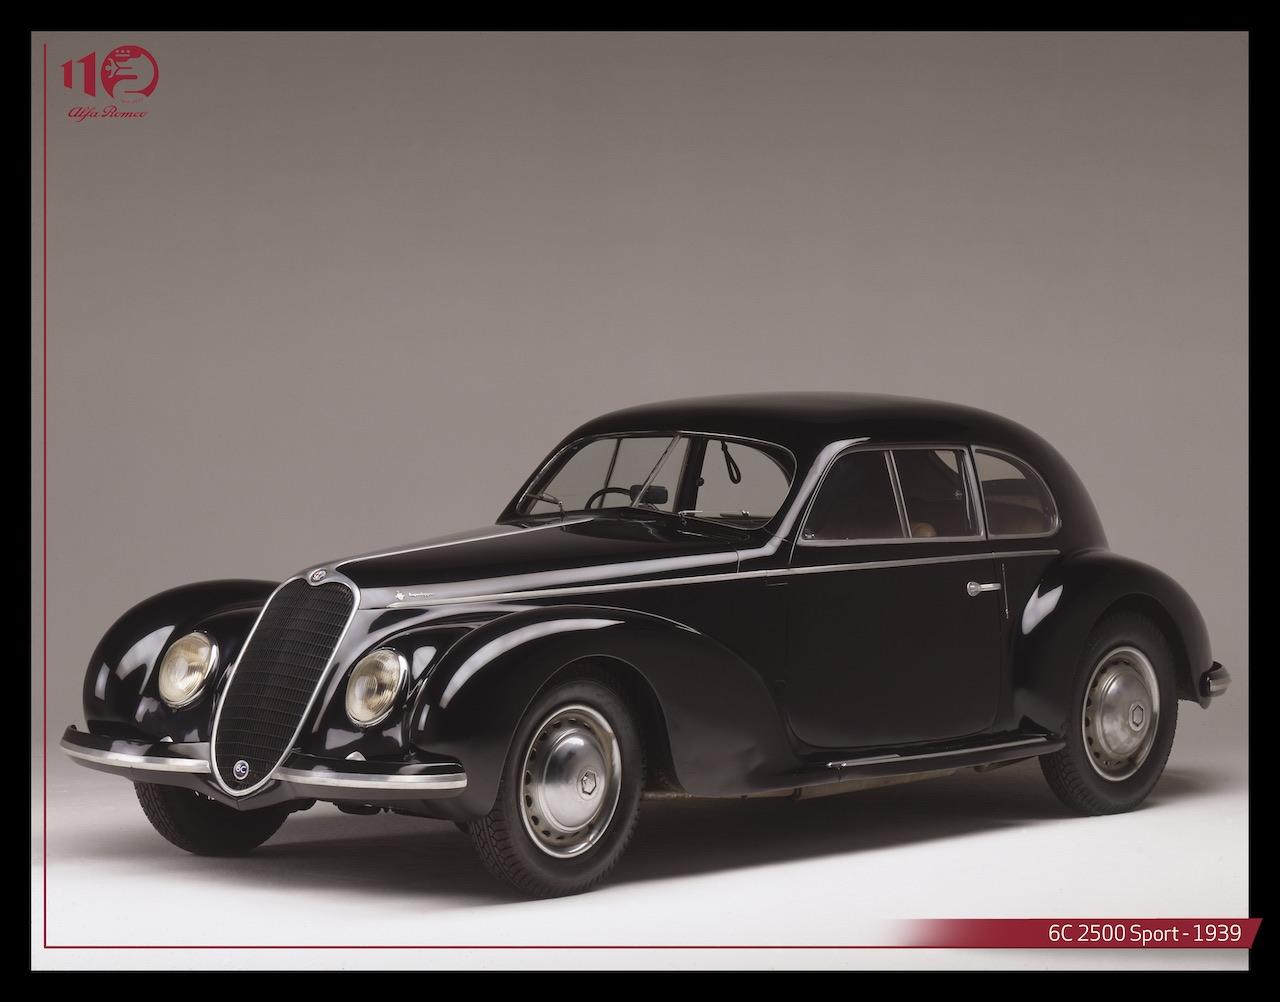 The elegance of the Alfa Romeo 6C 2500 Villa d'Este